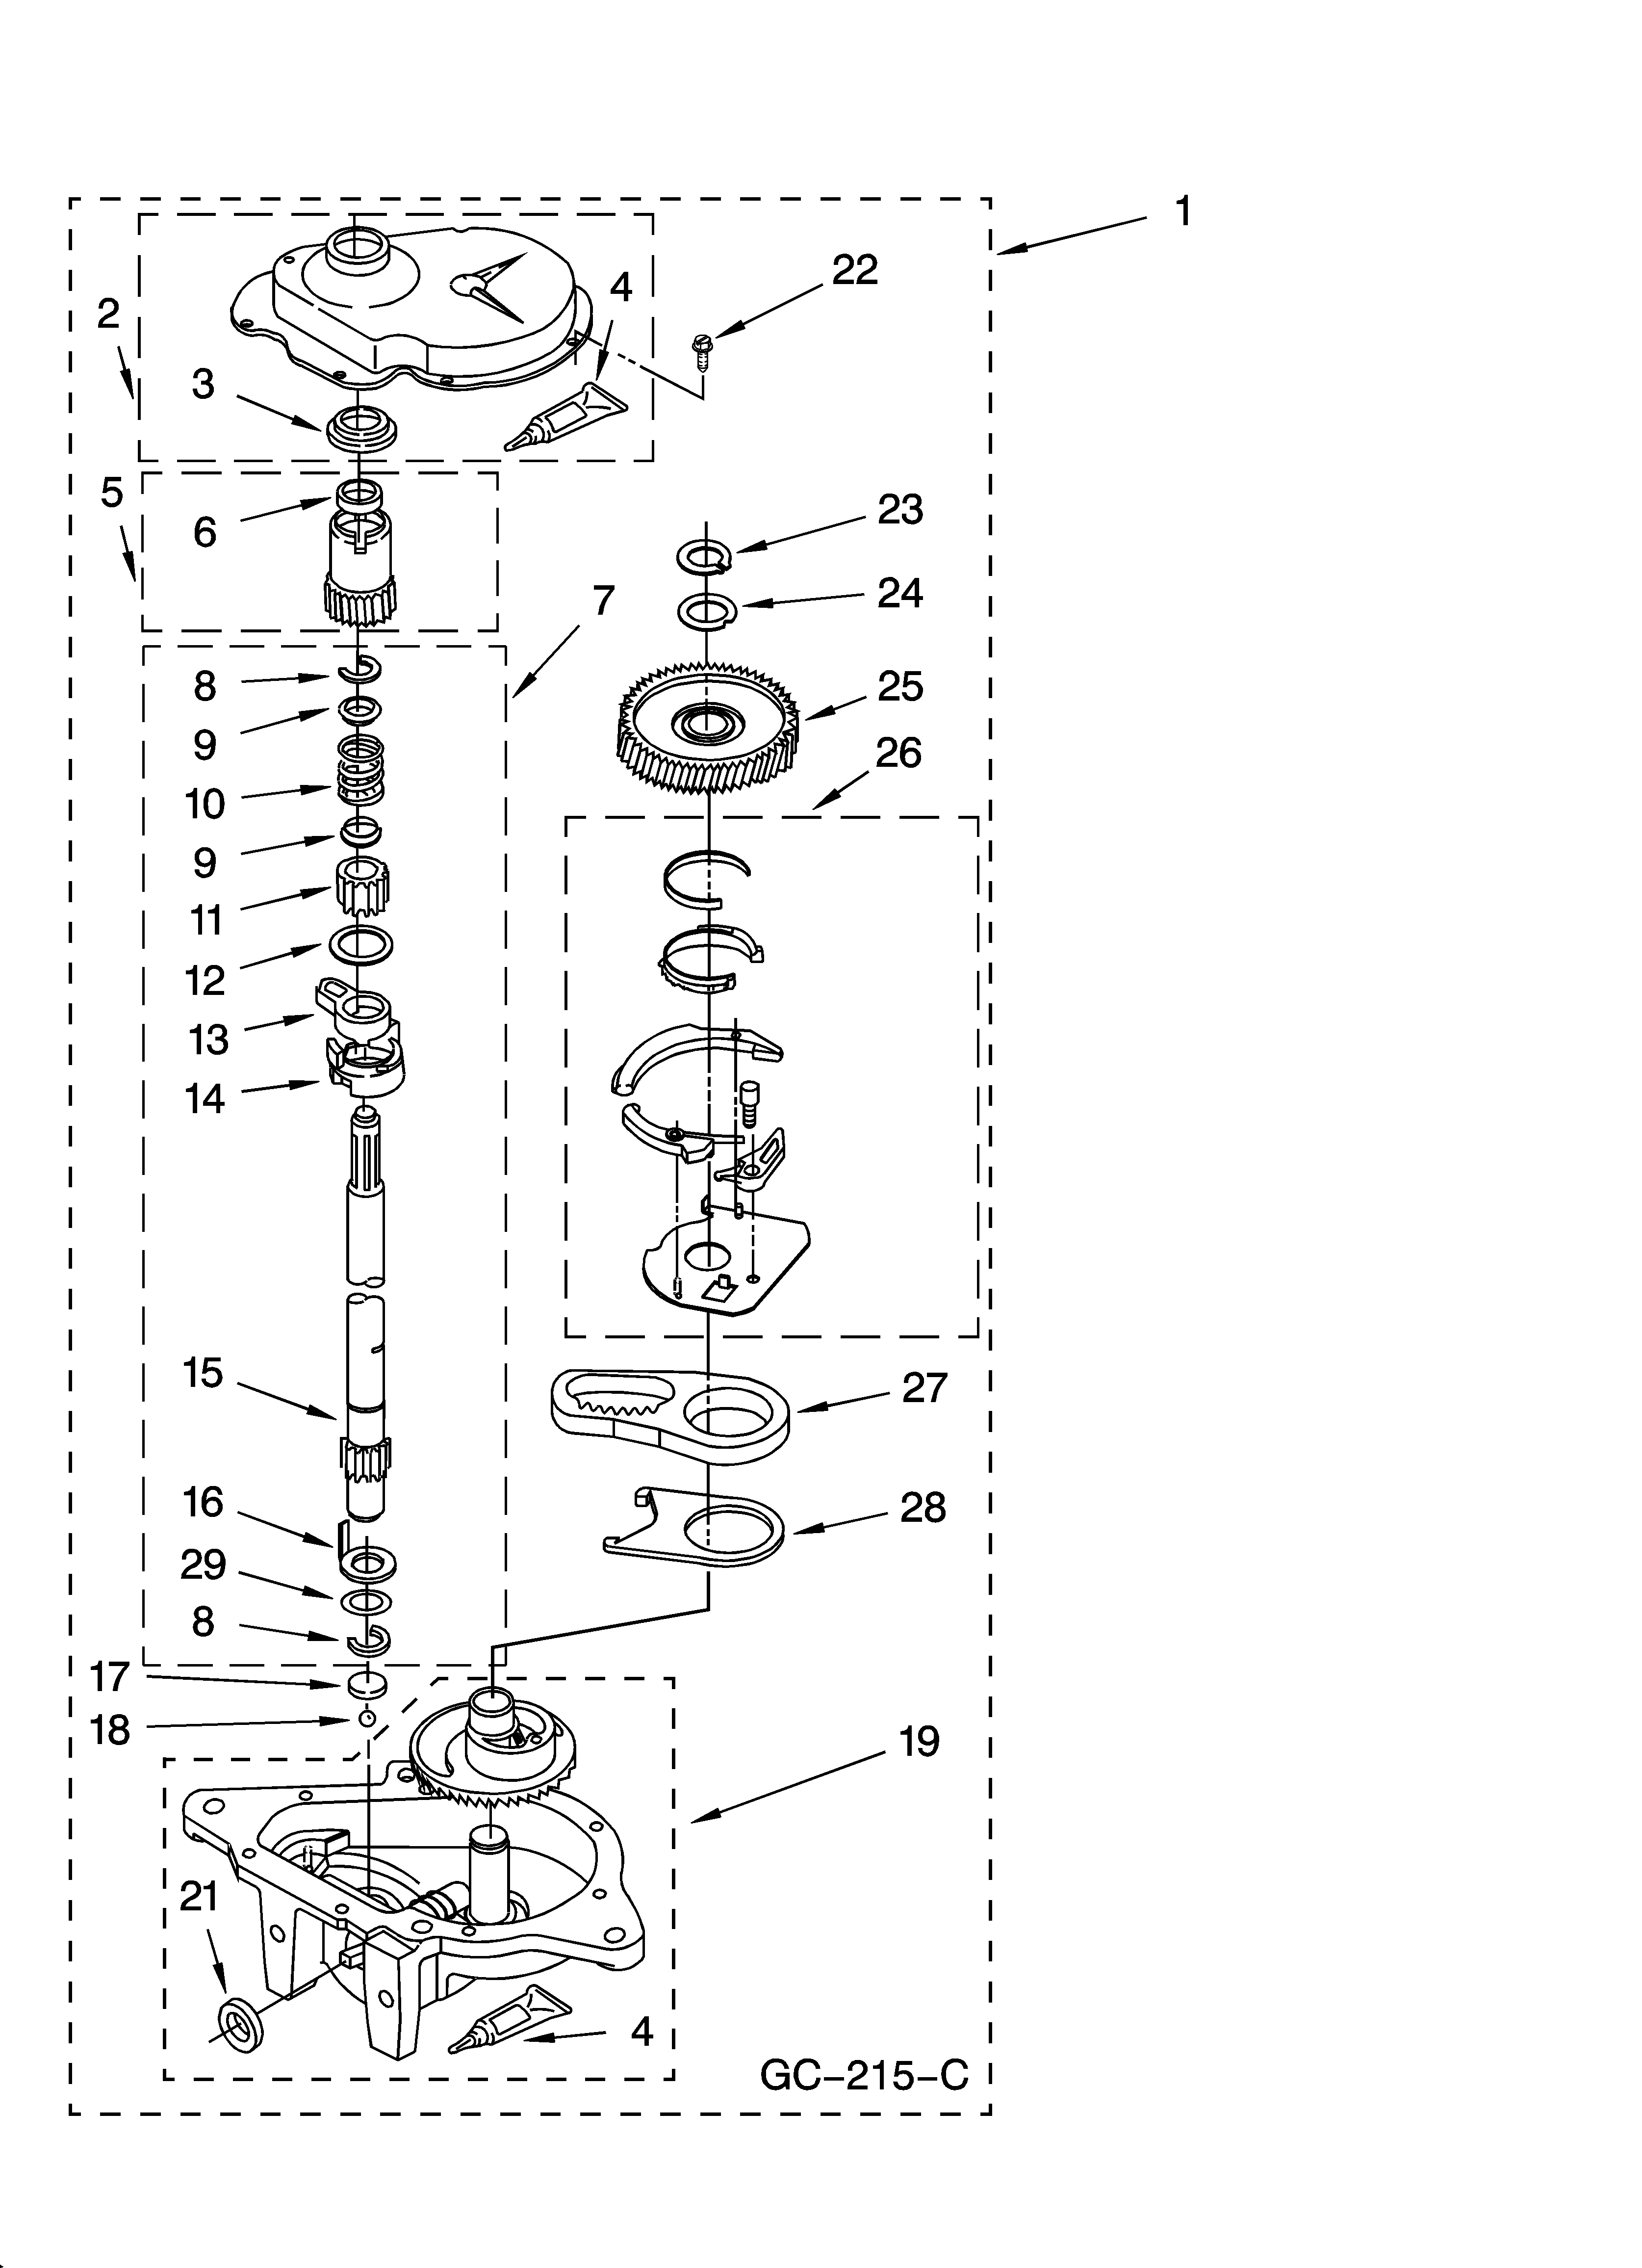 ME_6363] Whirlpool Washing Machine Diagram Of Parts Belt Drive Washer Help  Free DiagramAttr Papxe Mohammedshrine Librar Wiring 101